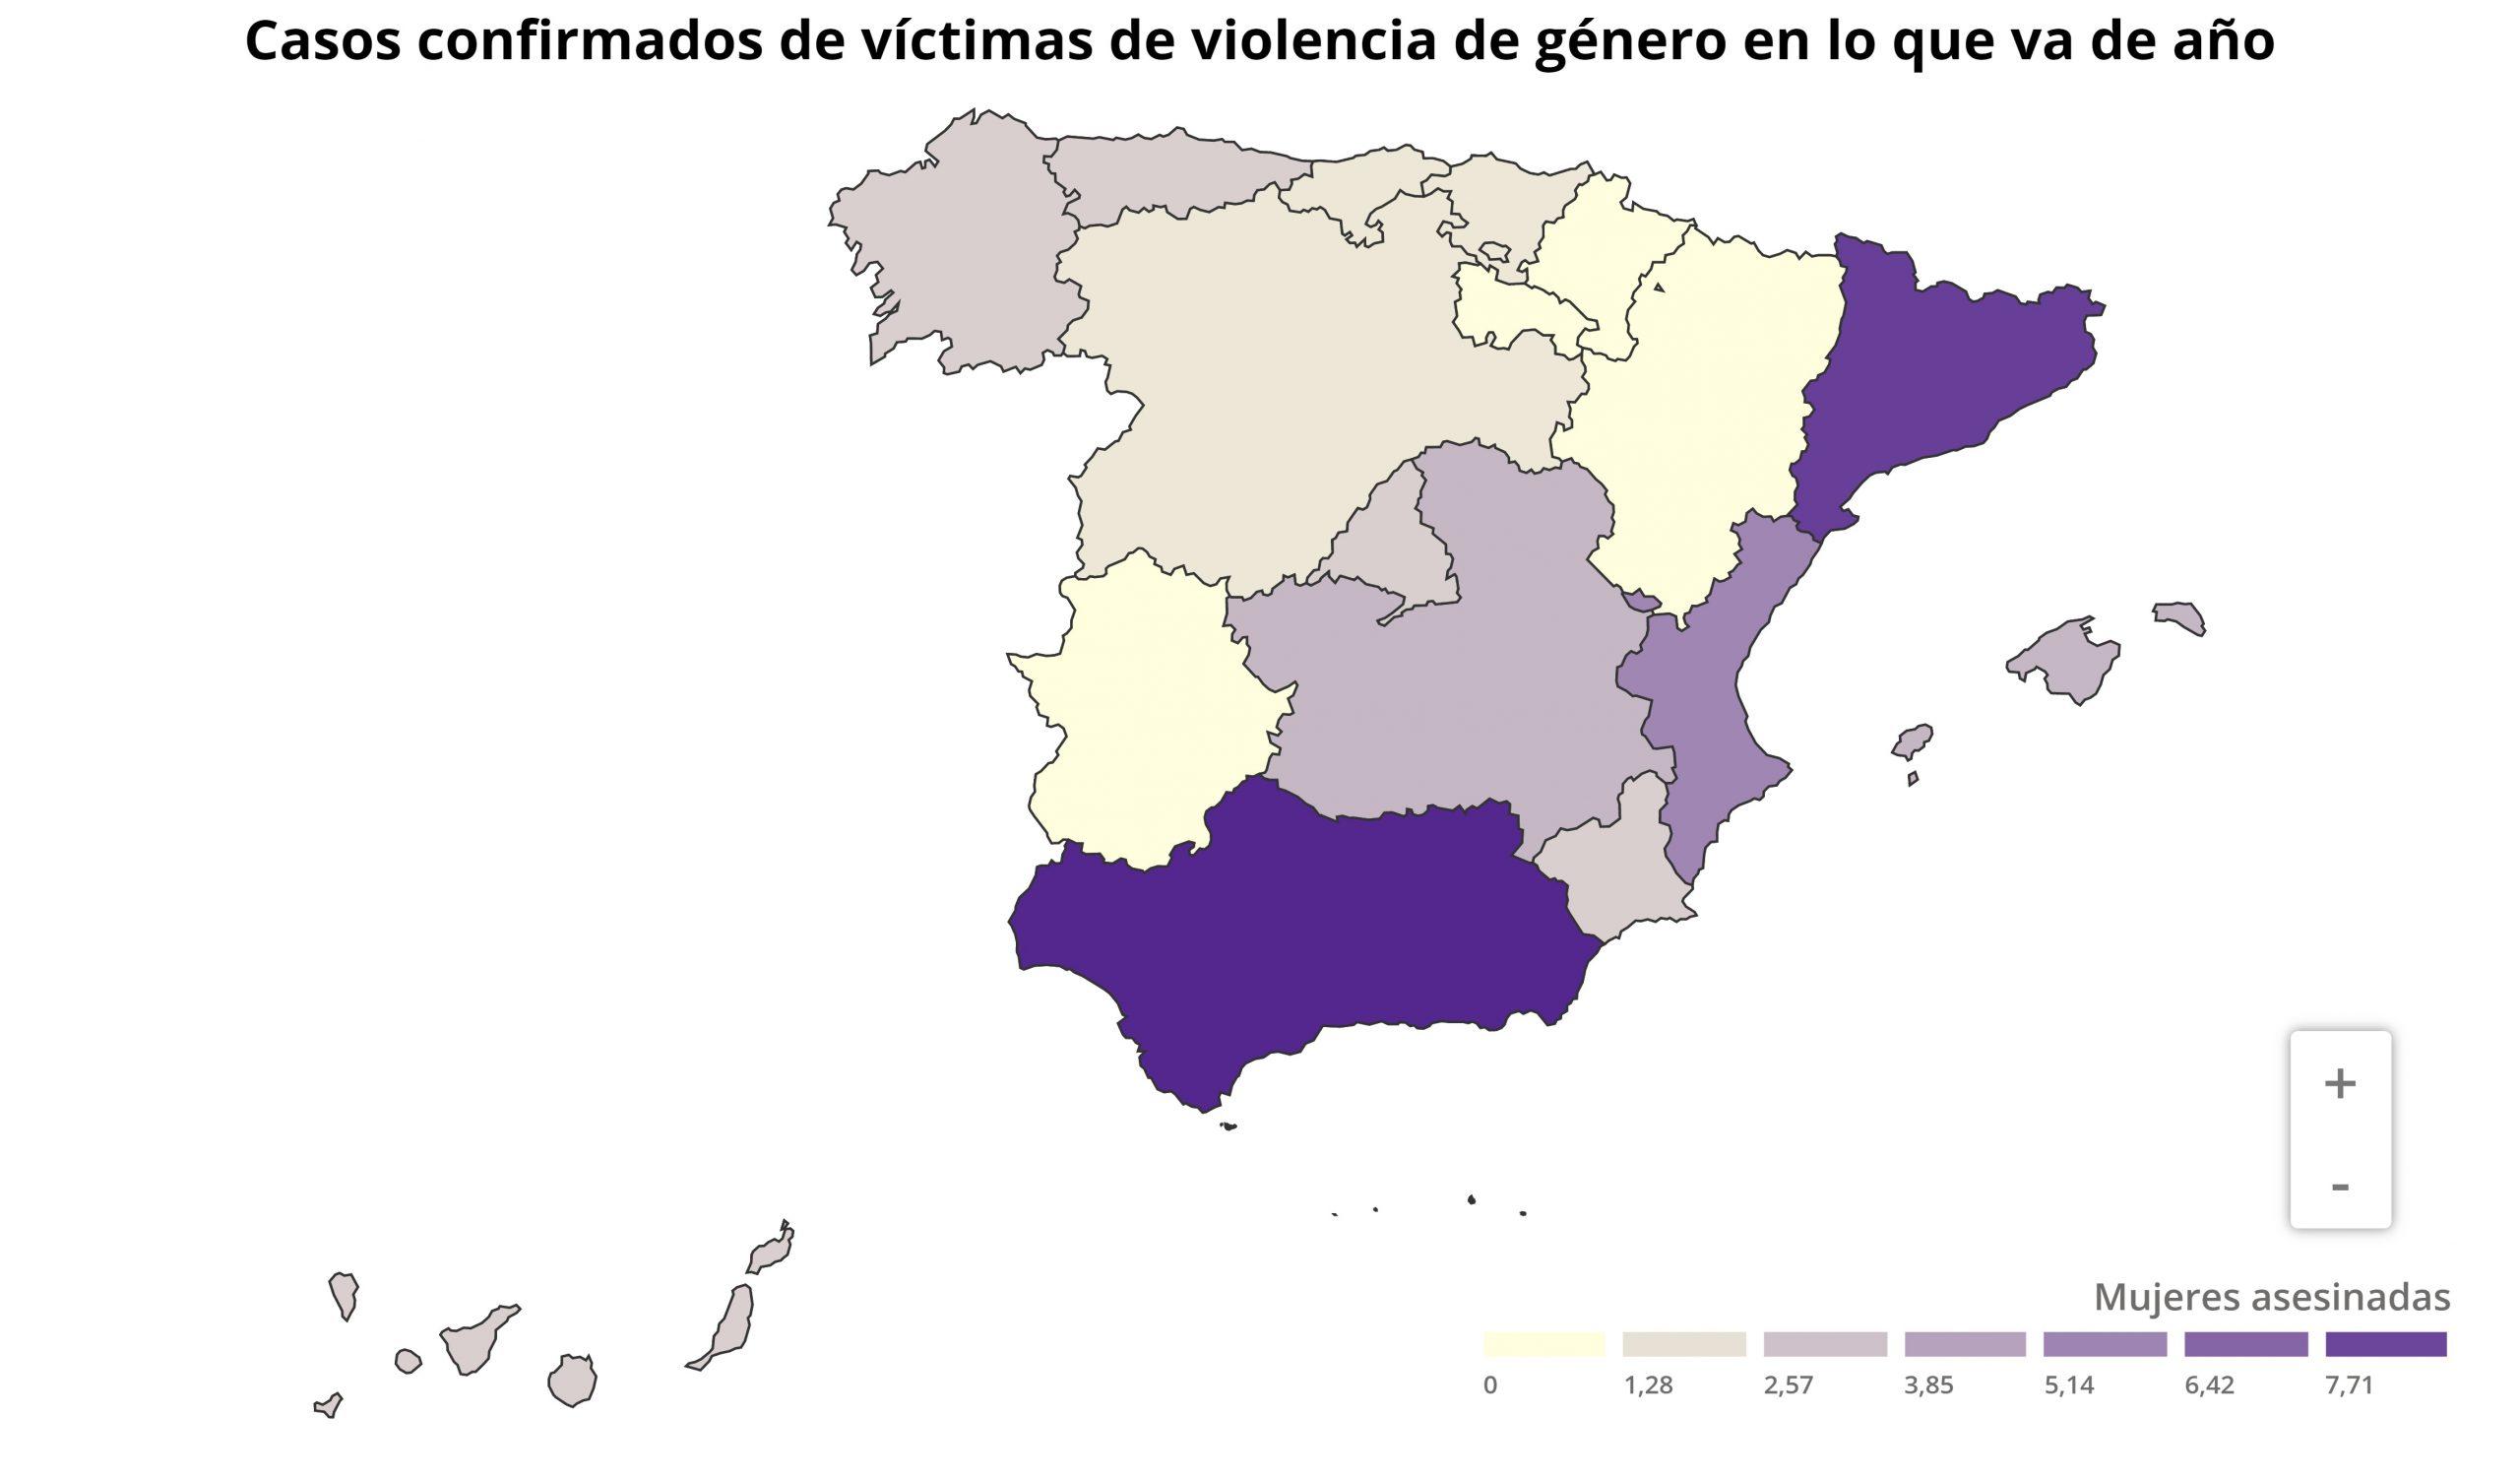 casos_confirmados_de_vict